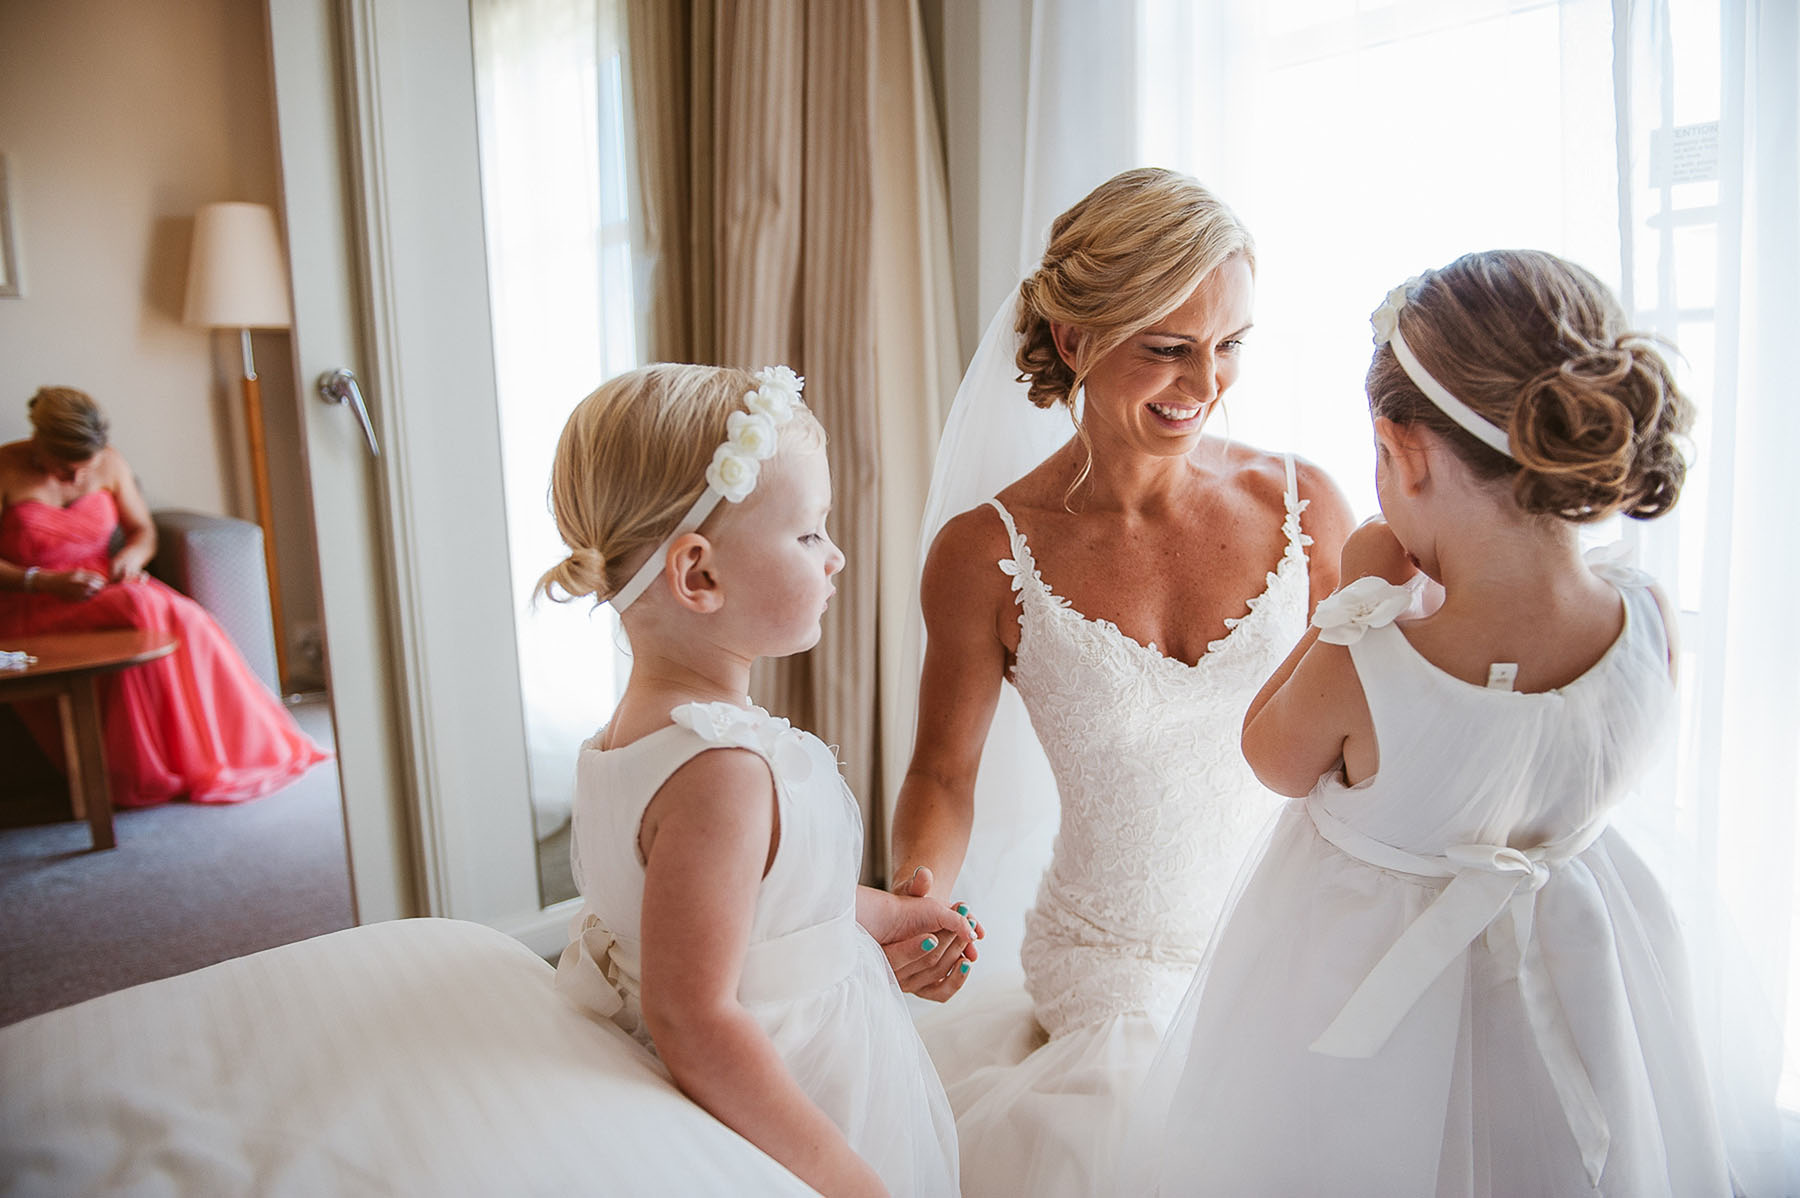 Marryme_wedding_photography_dorrigo_bellingen_photographer_38.jpg